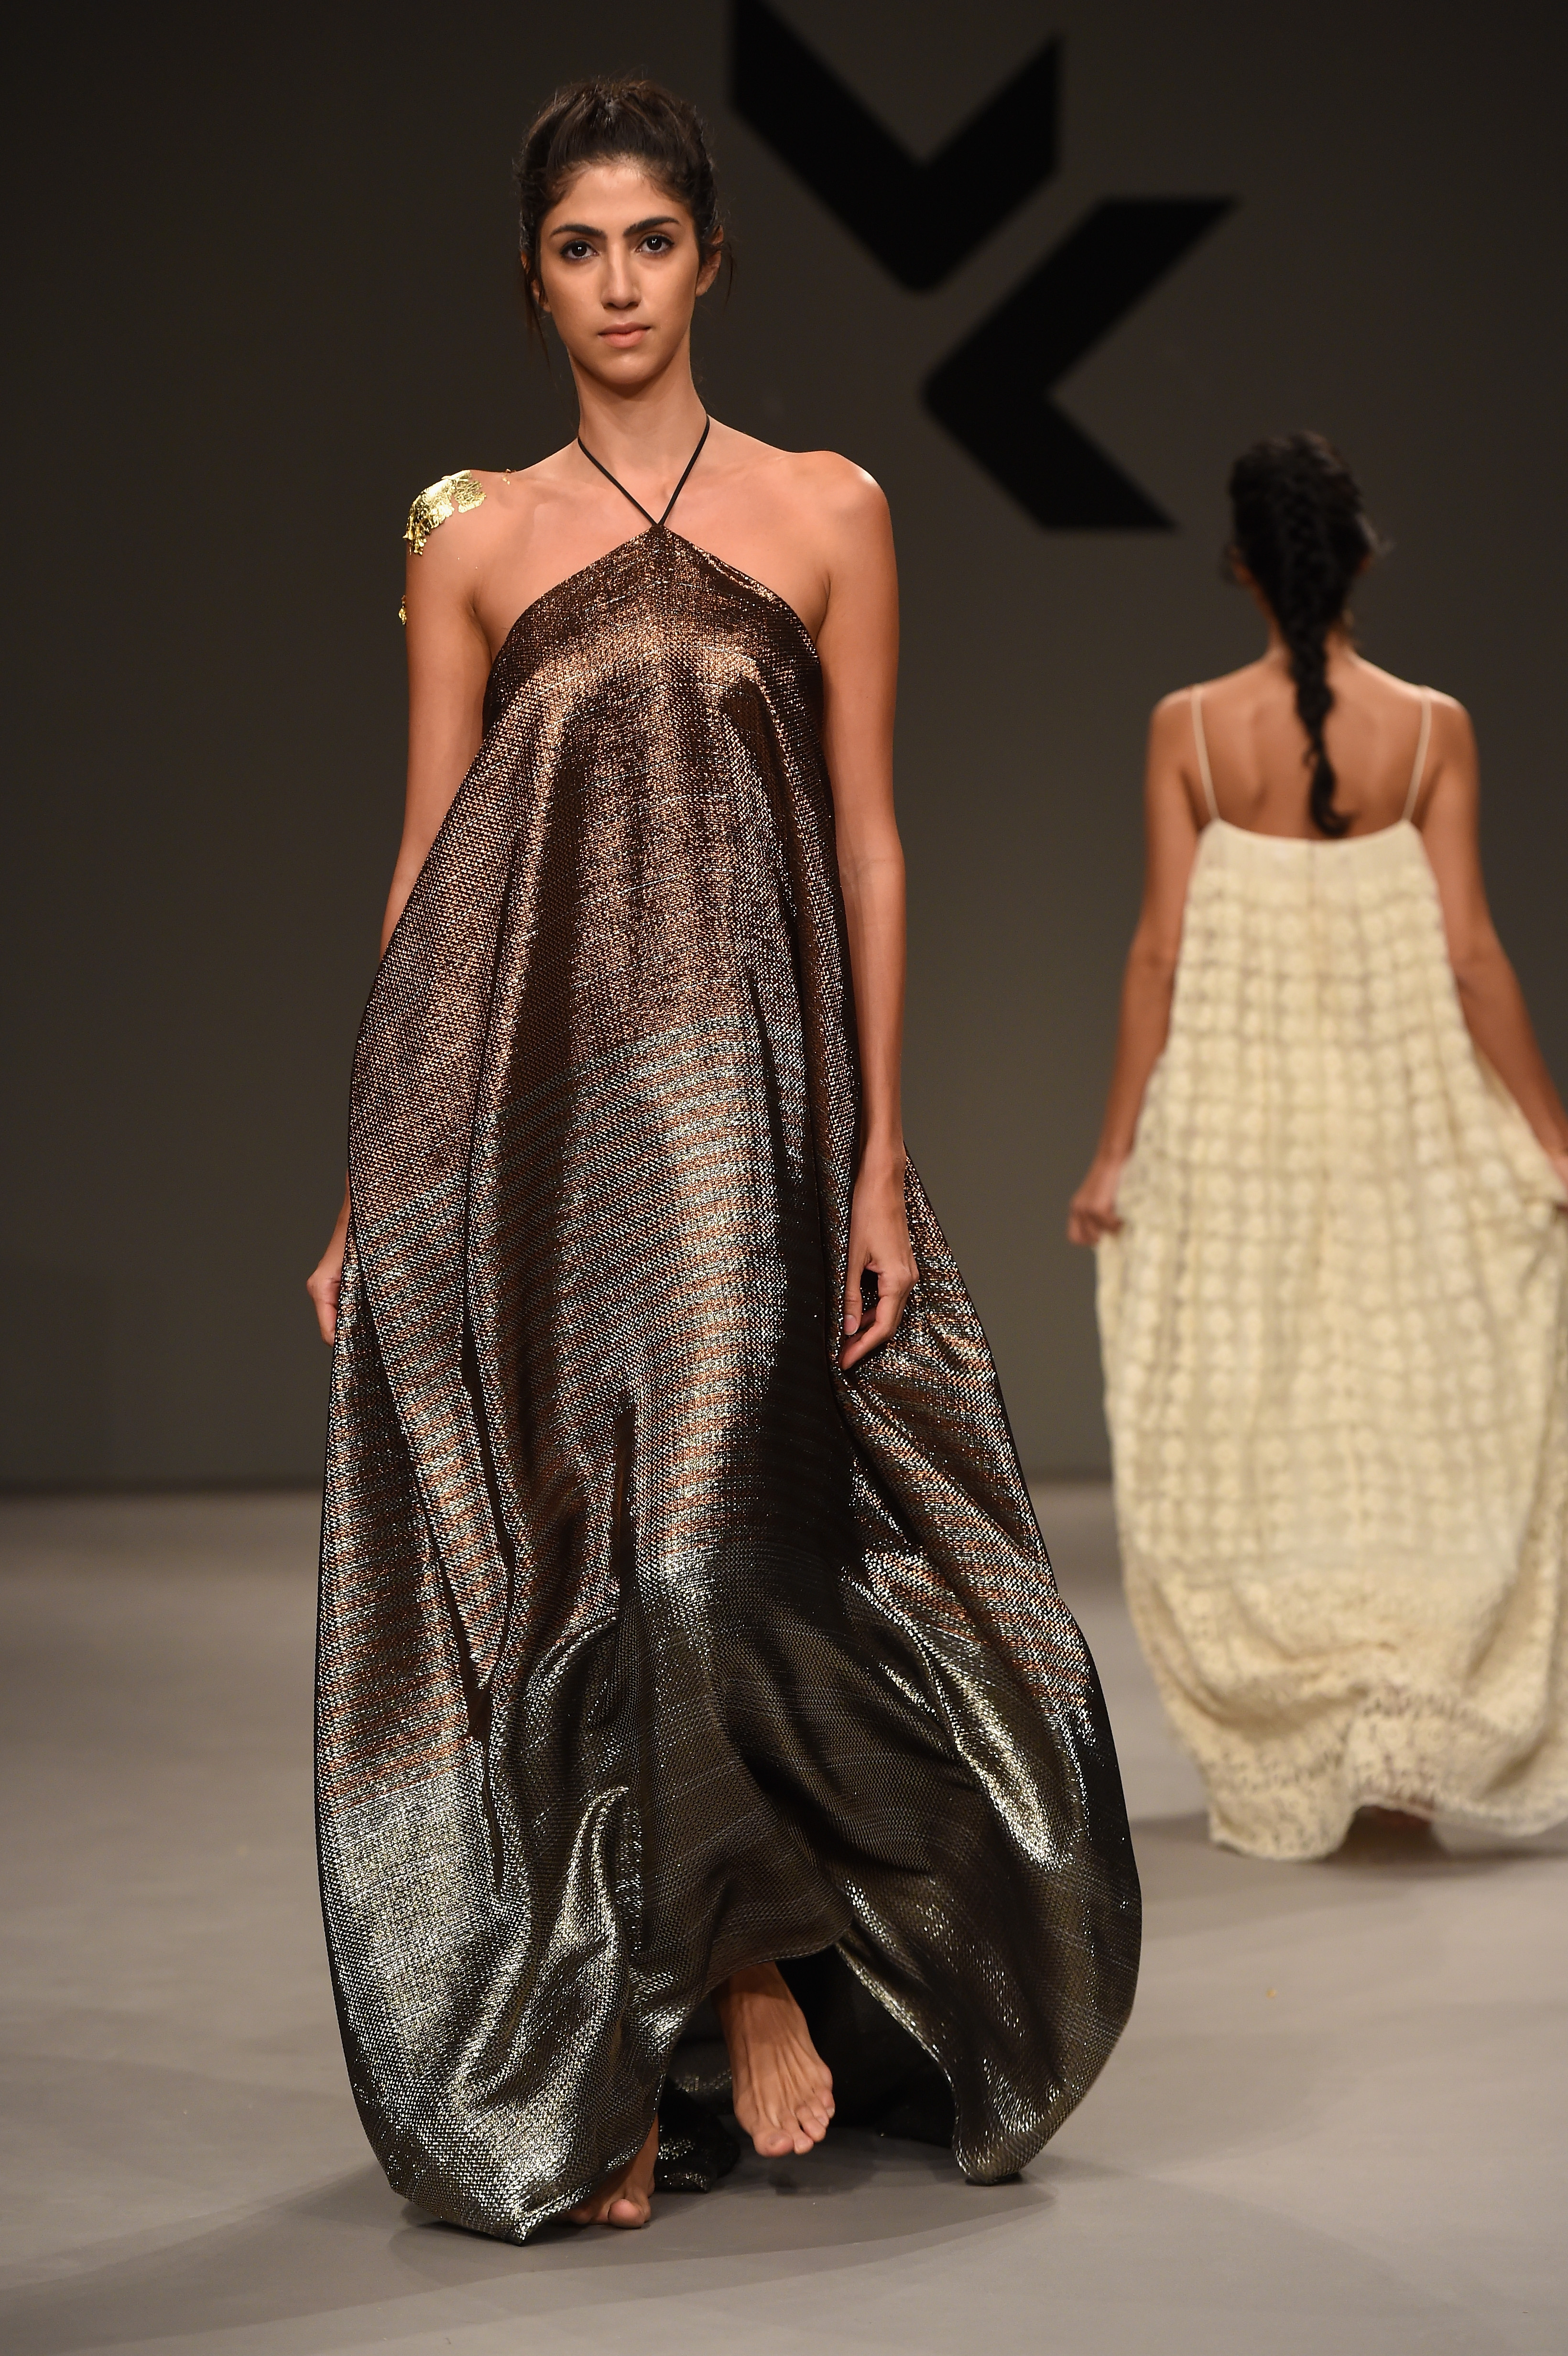 Lara Khoury - Fashion Forward Dubai Season 10, October 2017 - Photography by Stuart C. Wilson, Getty Images